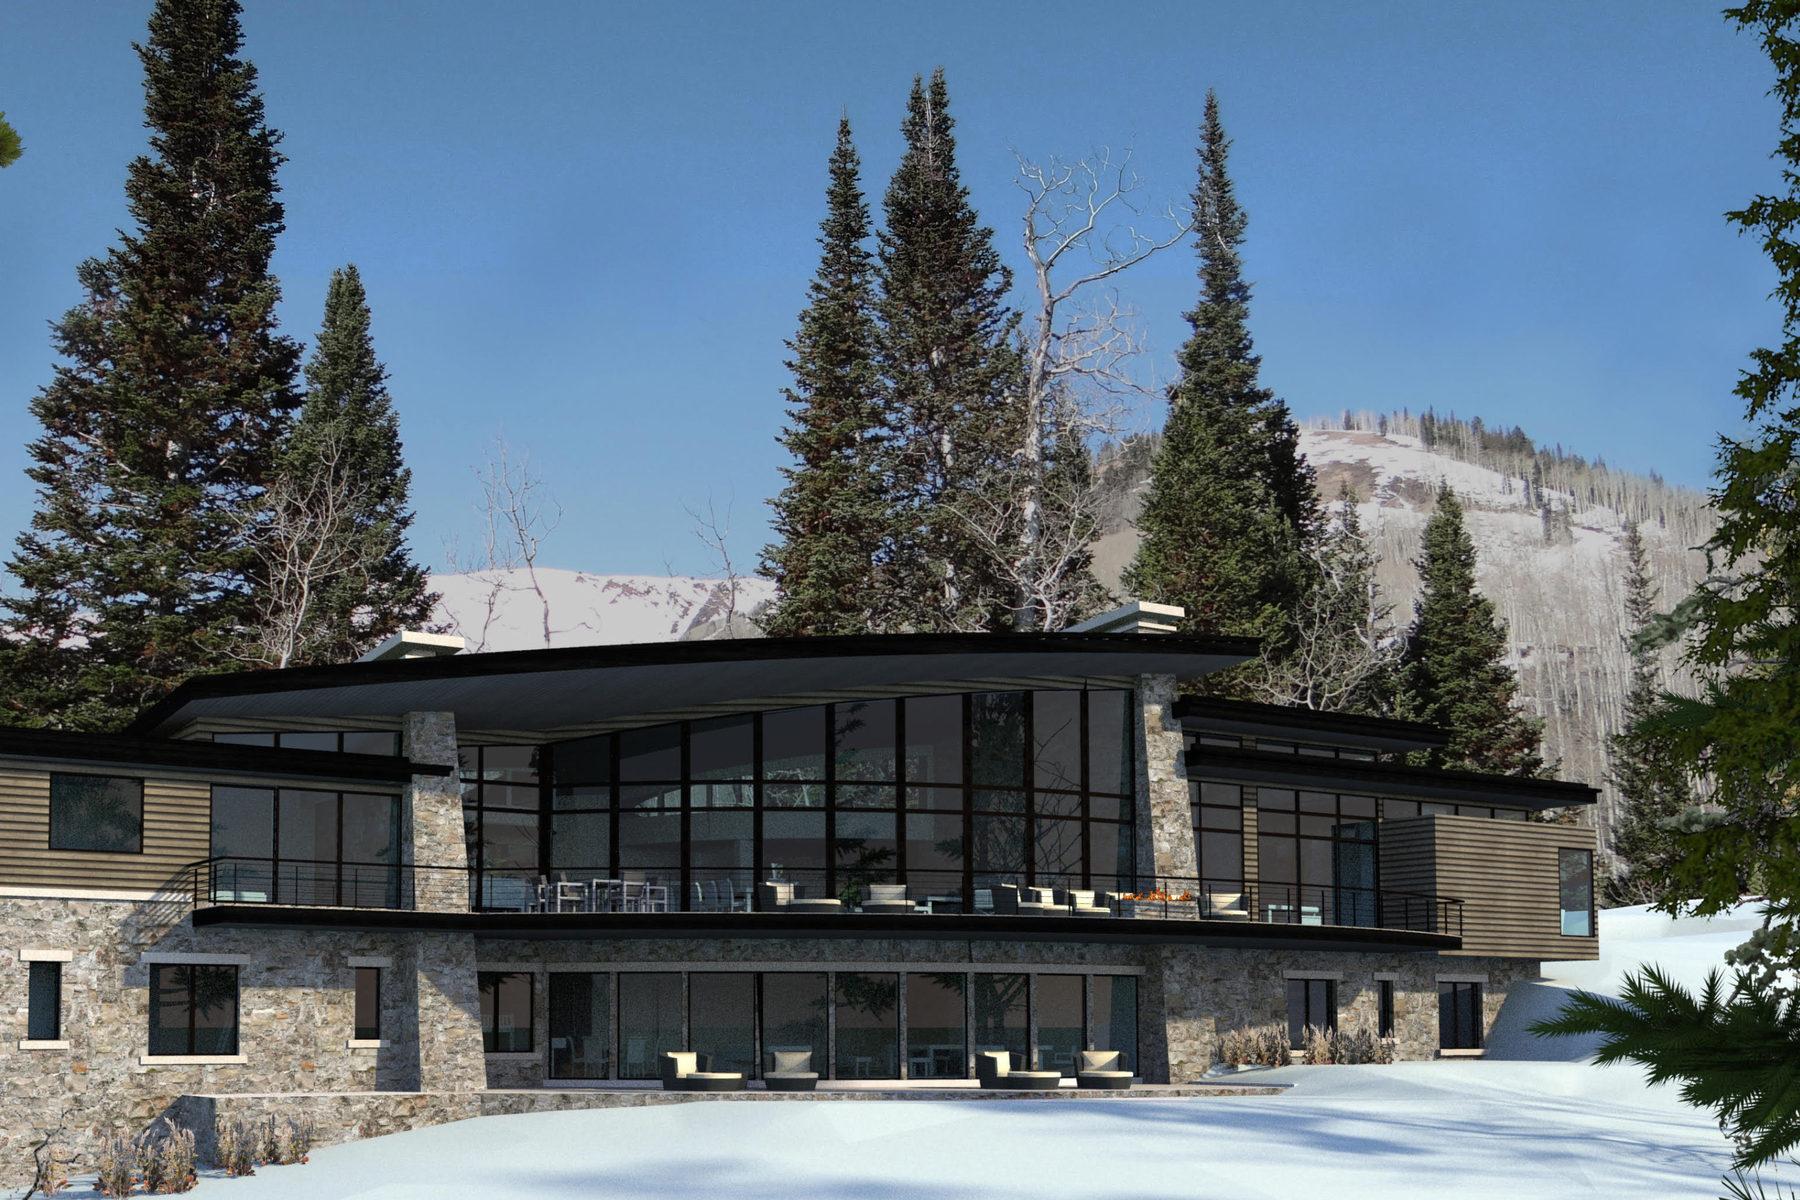 Terreno por un Venta en Architectural Plans Included that Will Capture the Views 207 White Pine Canyon Rd Park City, Utah 84060 Estados Unidos